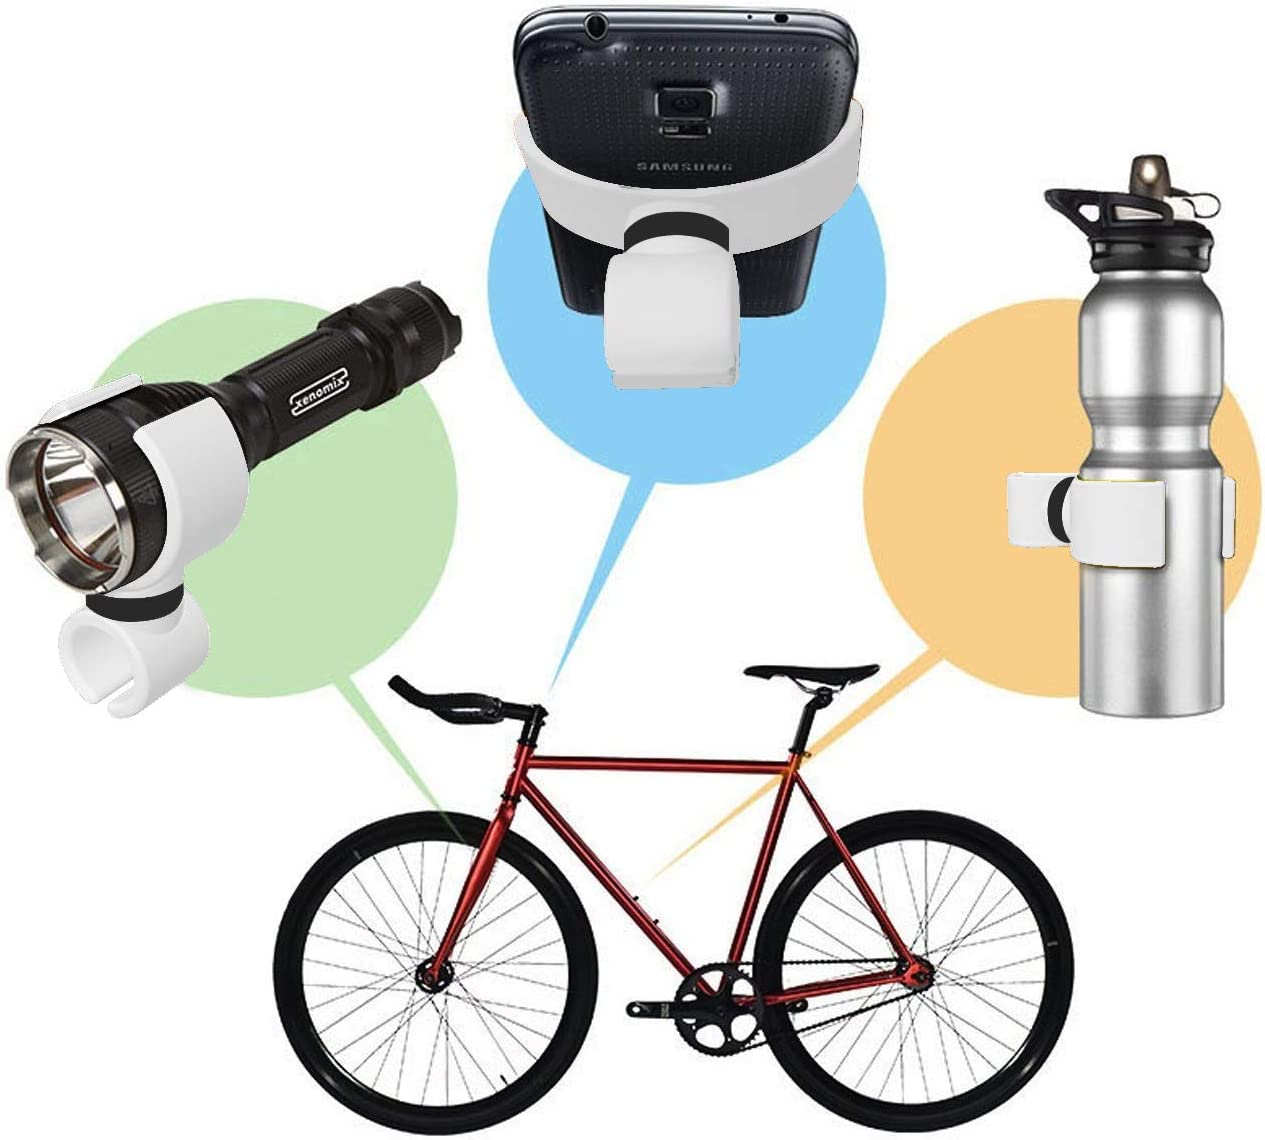 Soporte Huawei P9 lite bici soporte linterna bicicleta soporte ...